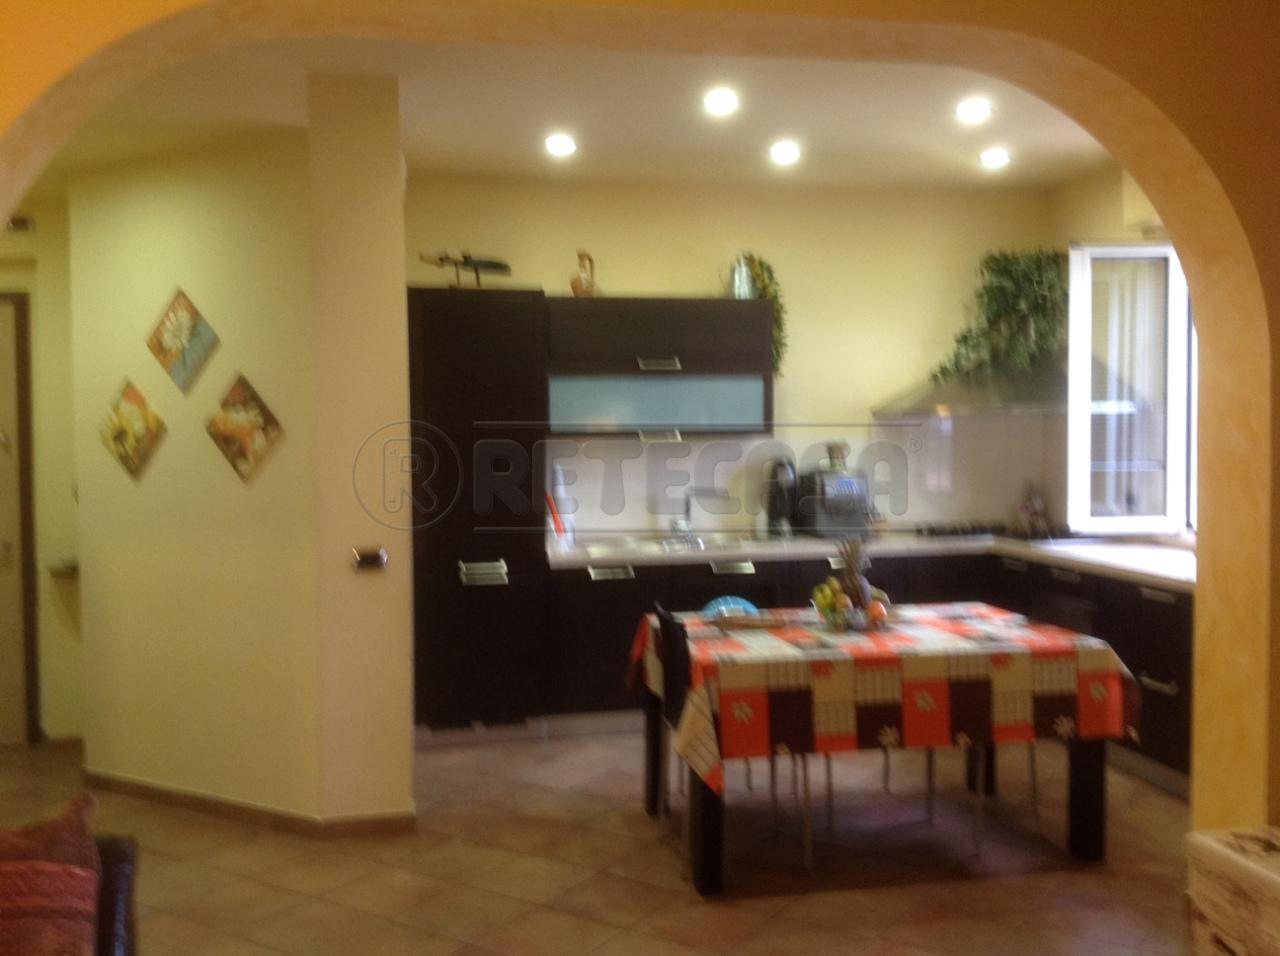 Bilocale in vendita a Ancona in Via Redi